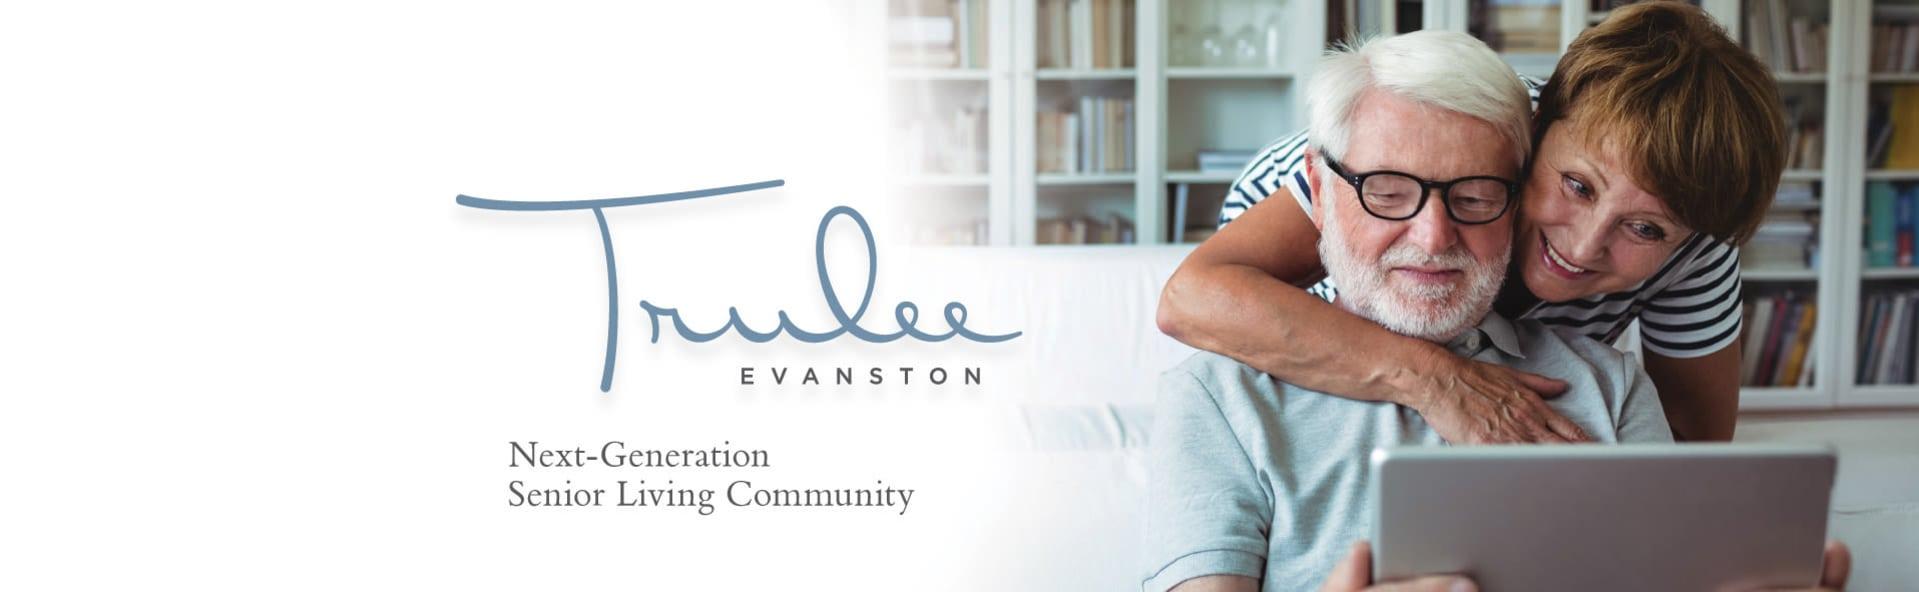 Senior living at Trulee Evanston in Evanston, Illinois